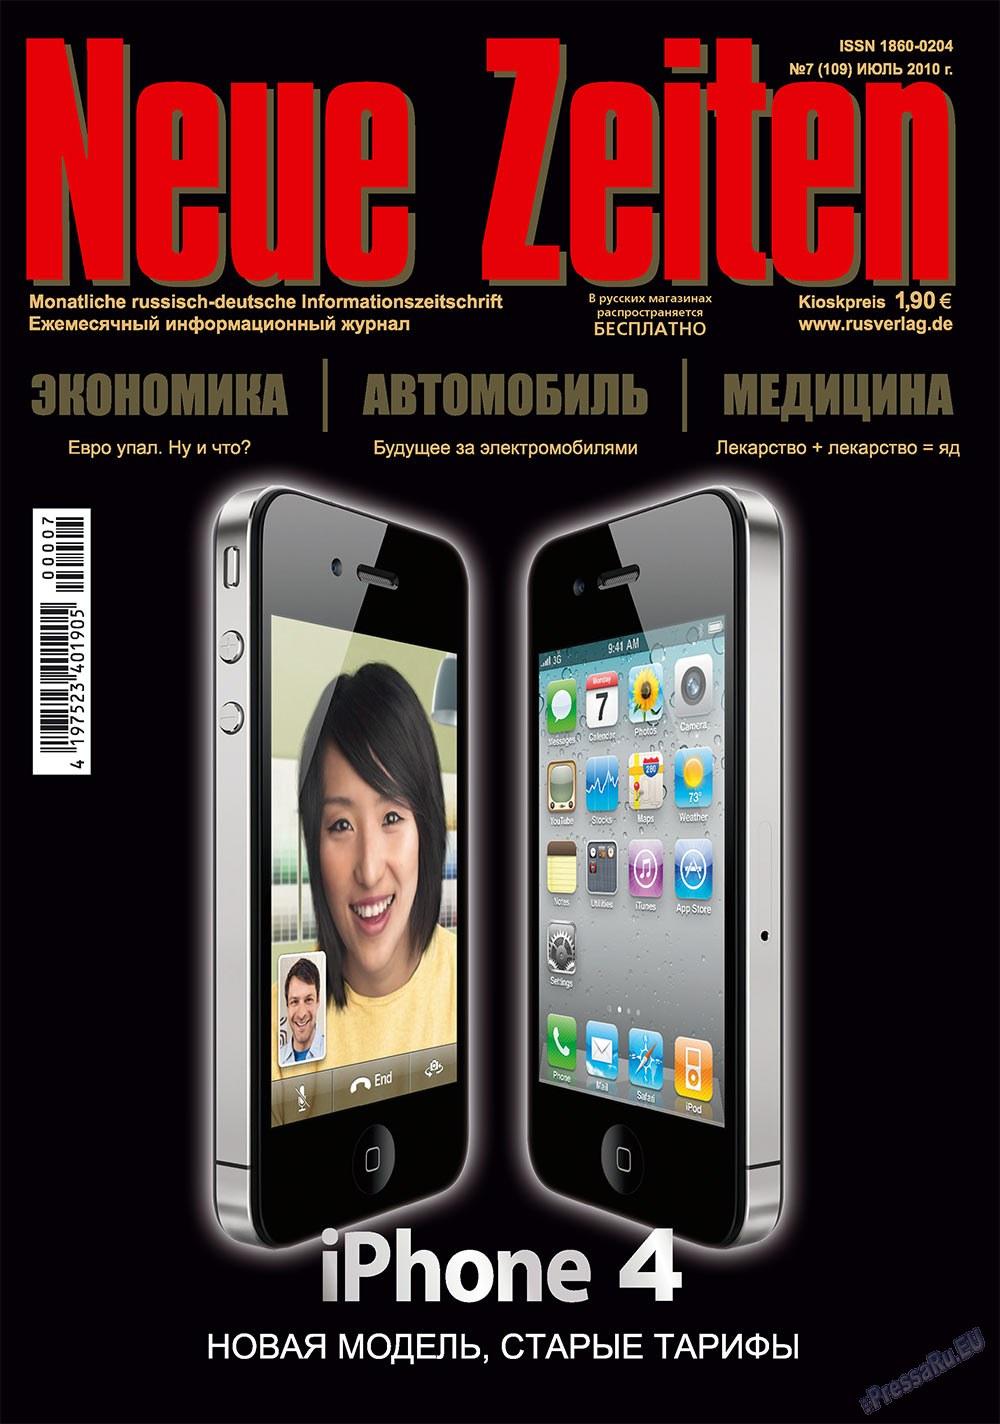 Neue Zeiten (журнал). 2010 год, номер 7, стр. 1